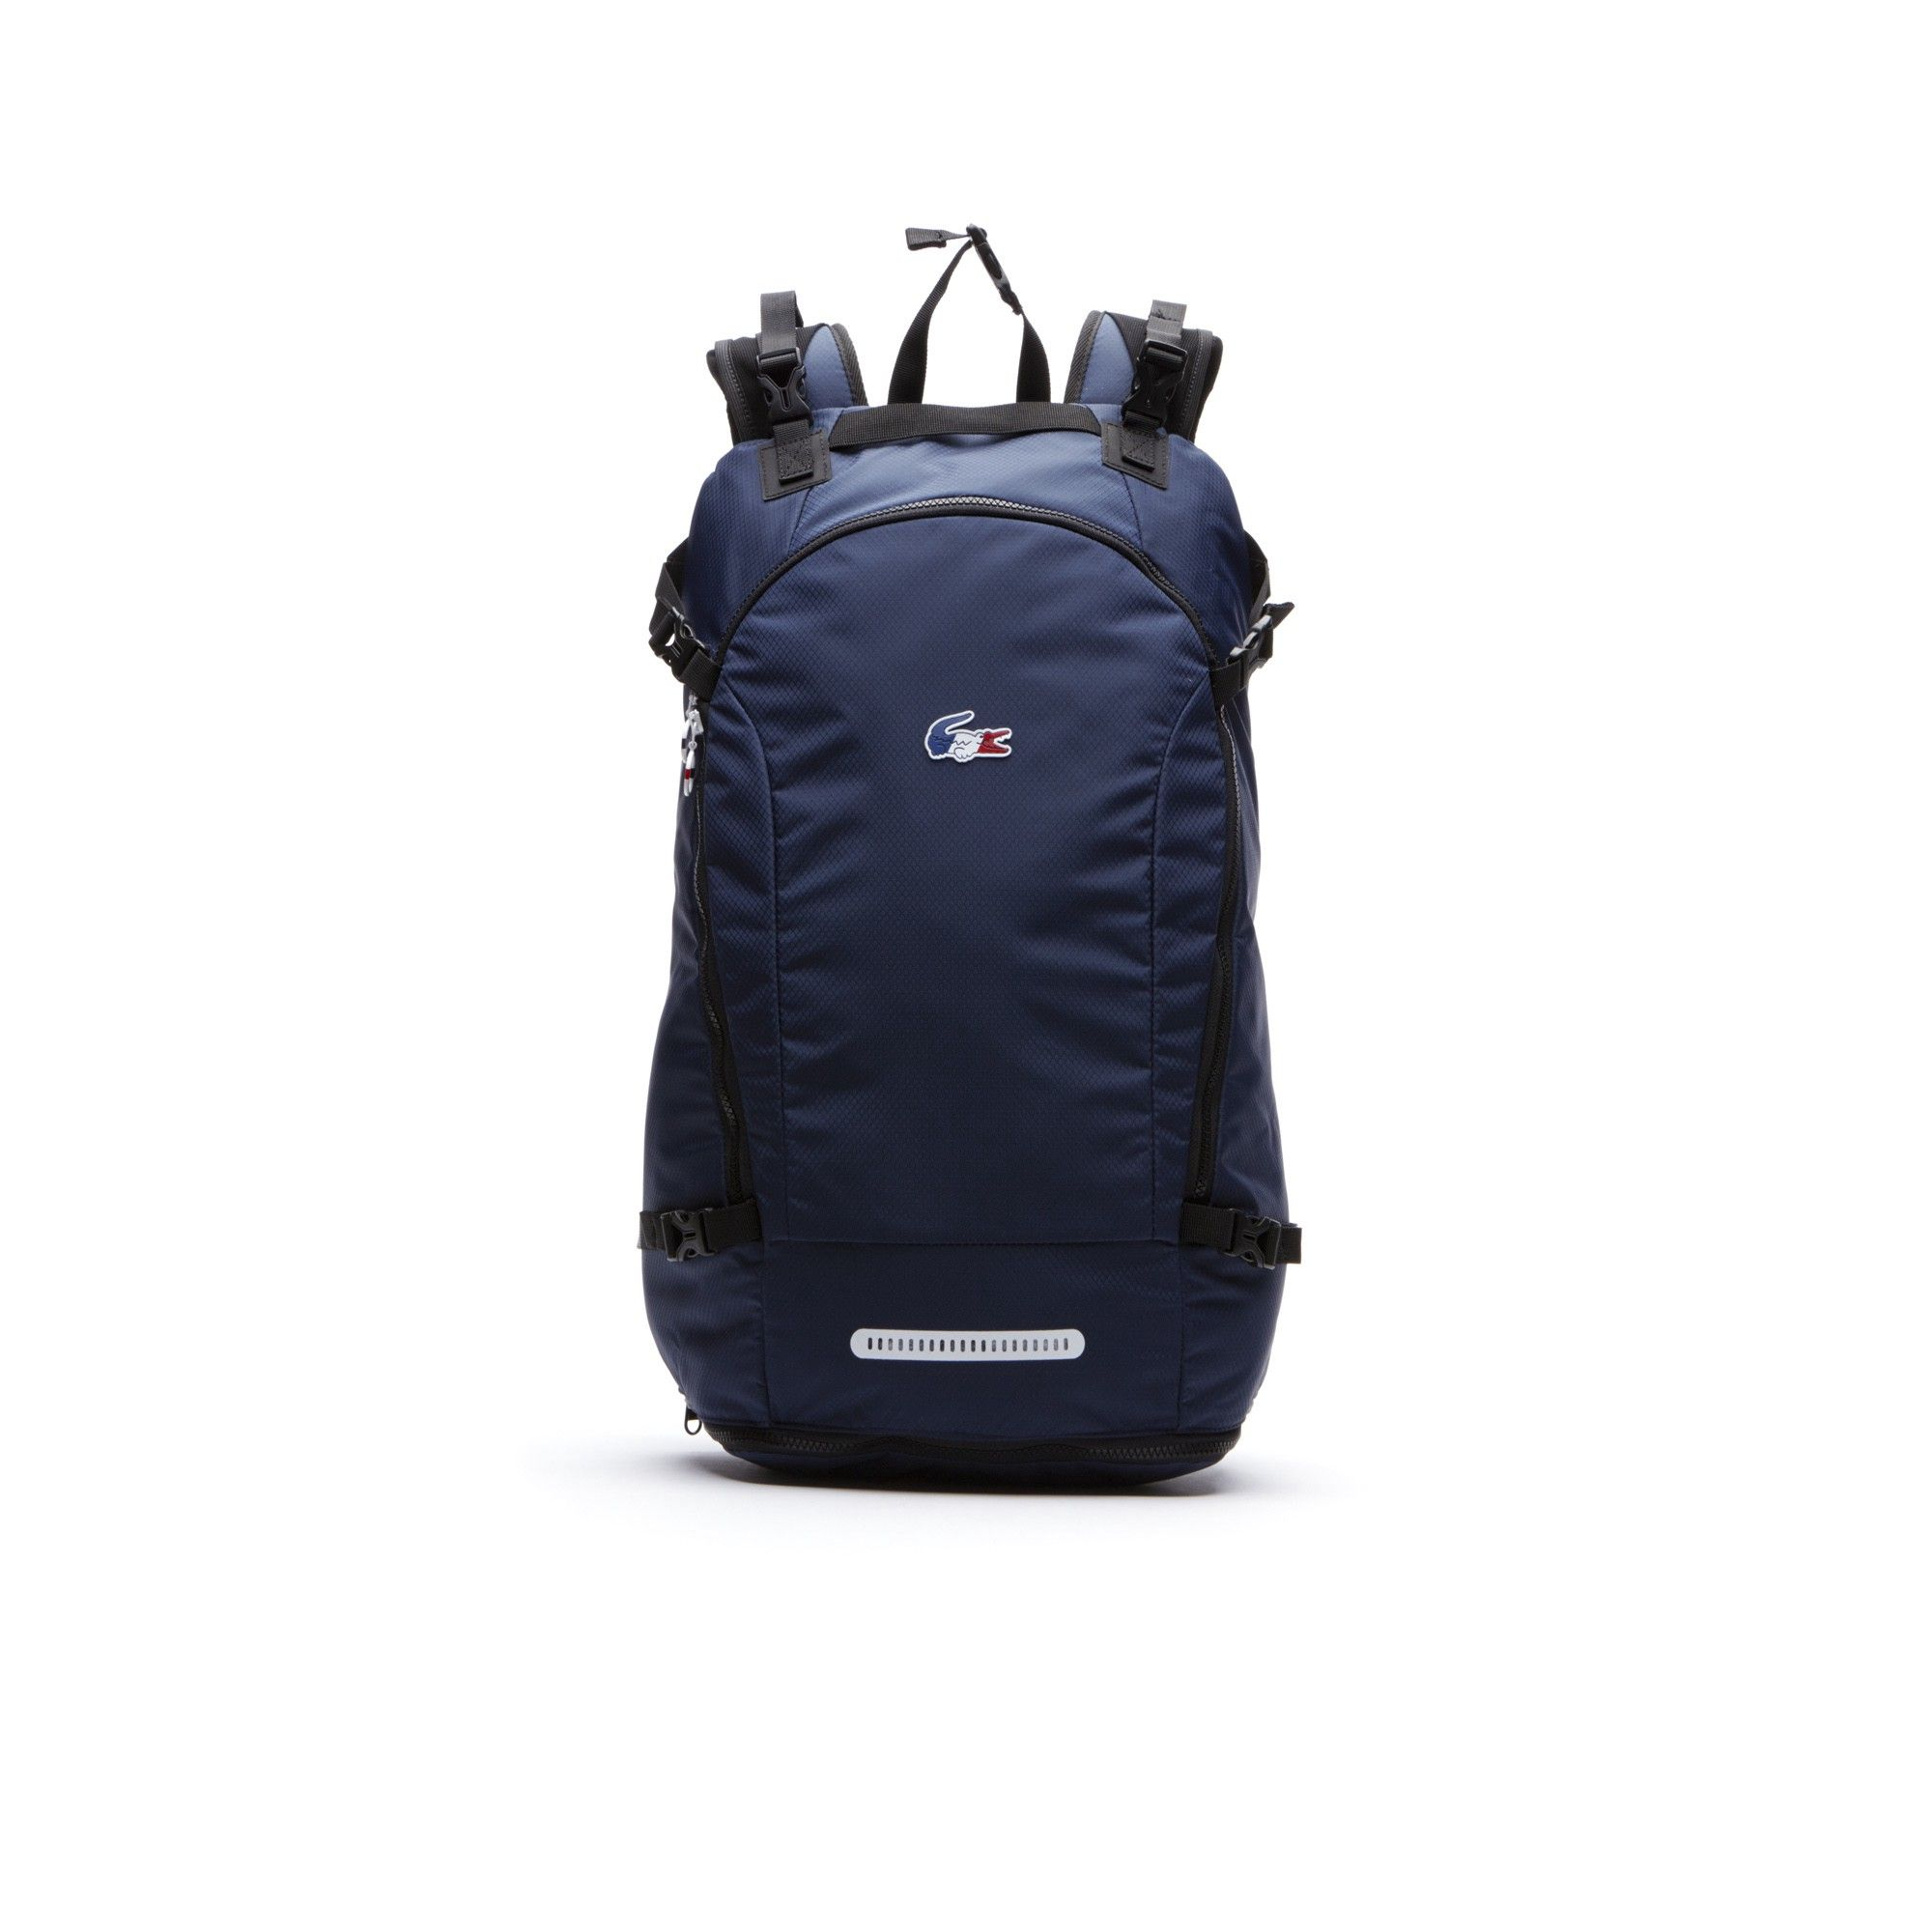 0490cb1a41 Lacoste Men s Sport Olympic Games Backpack - Og18